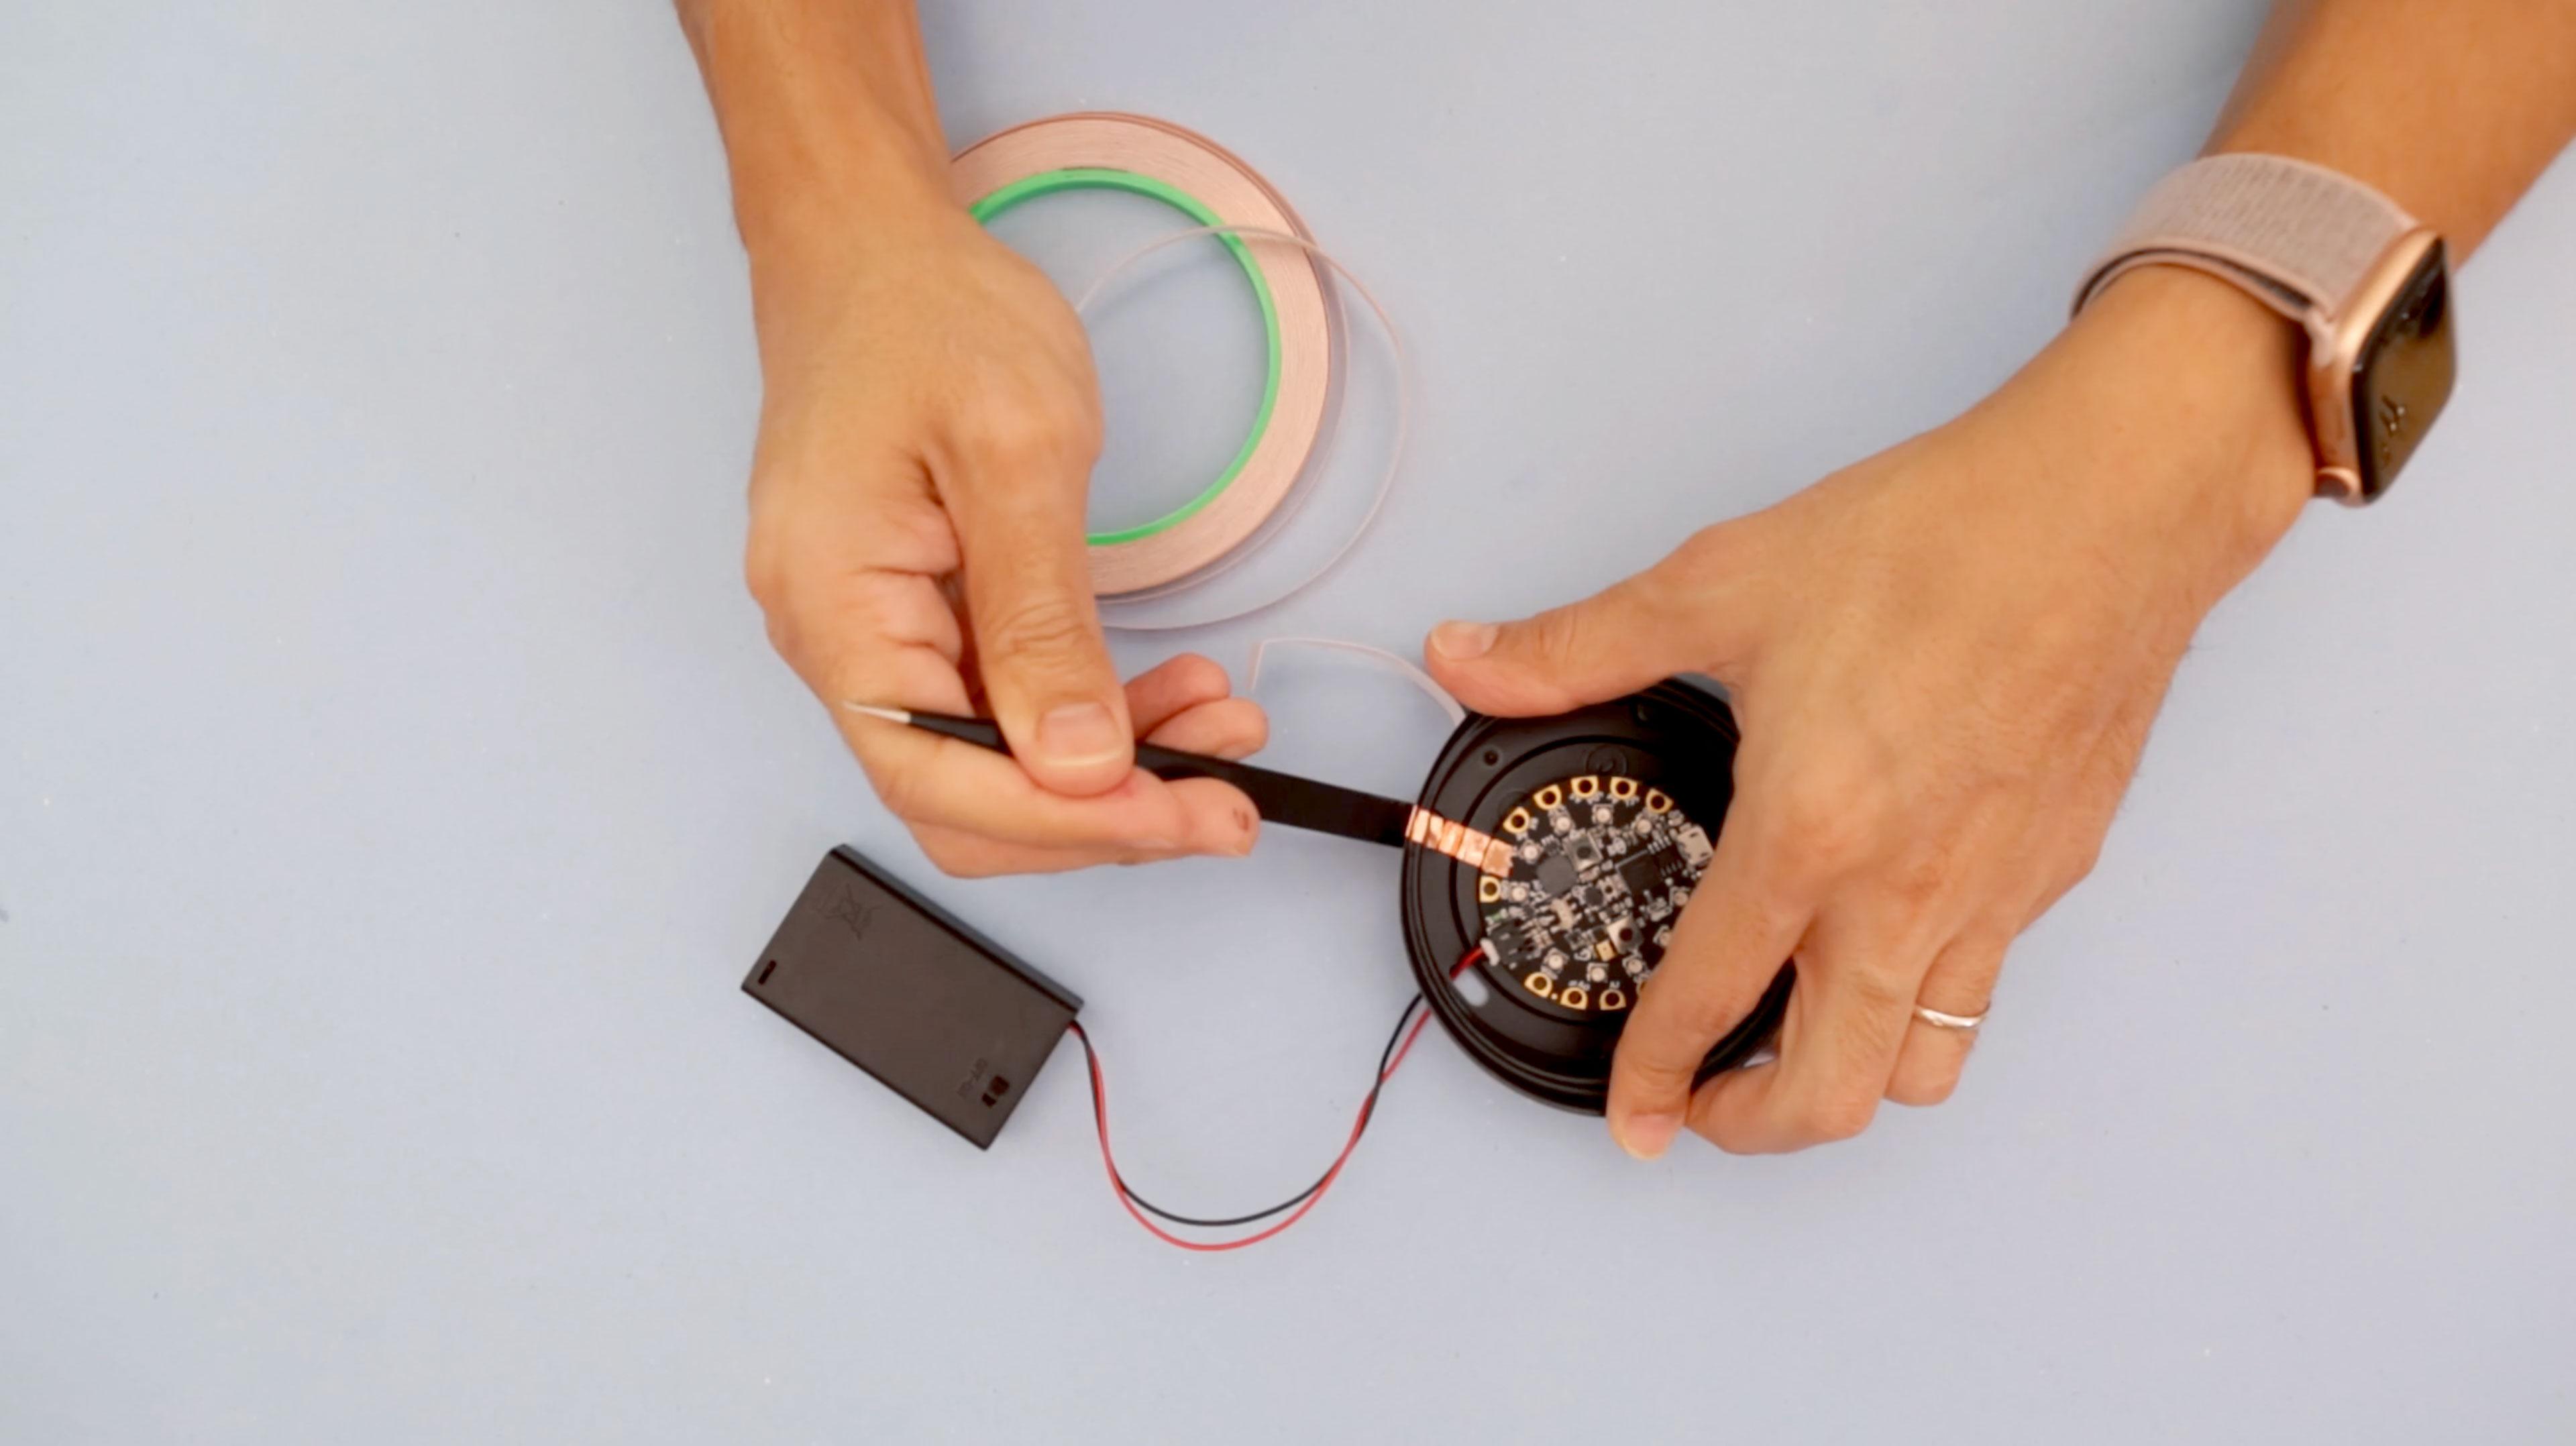 circuit_playground_lid-trace.jpg